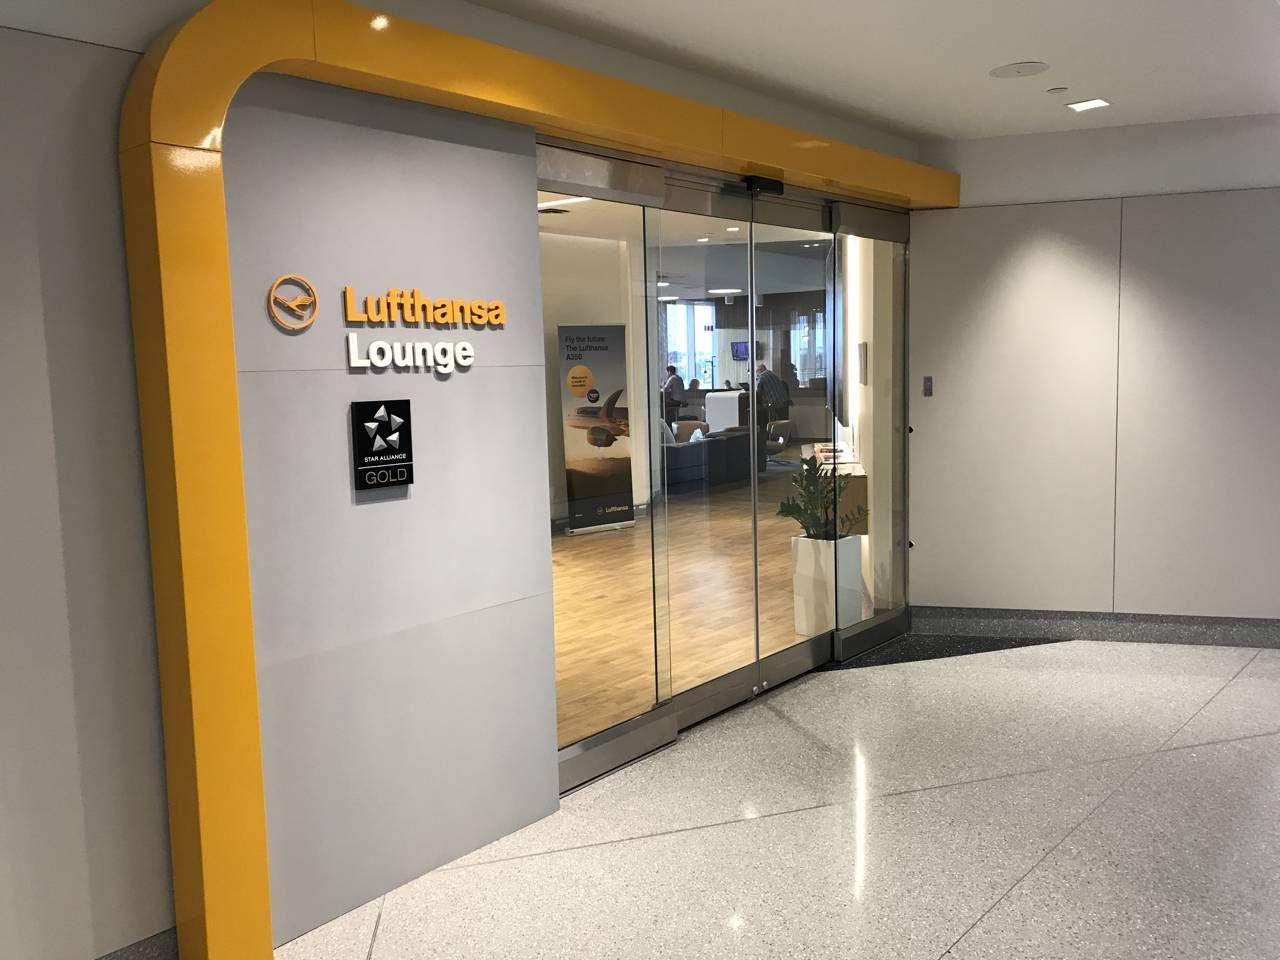 Sala VIP Lufthansa Lounge – Aeroporto de Boston (BOS)